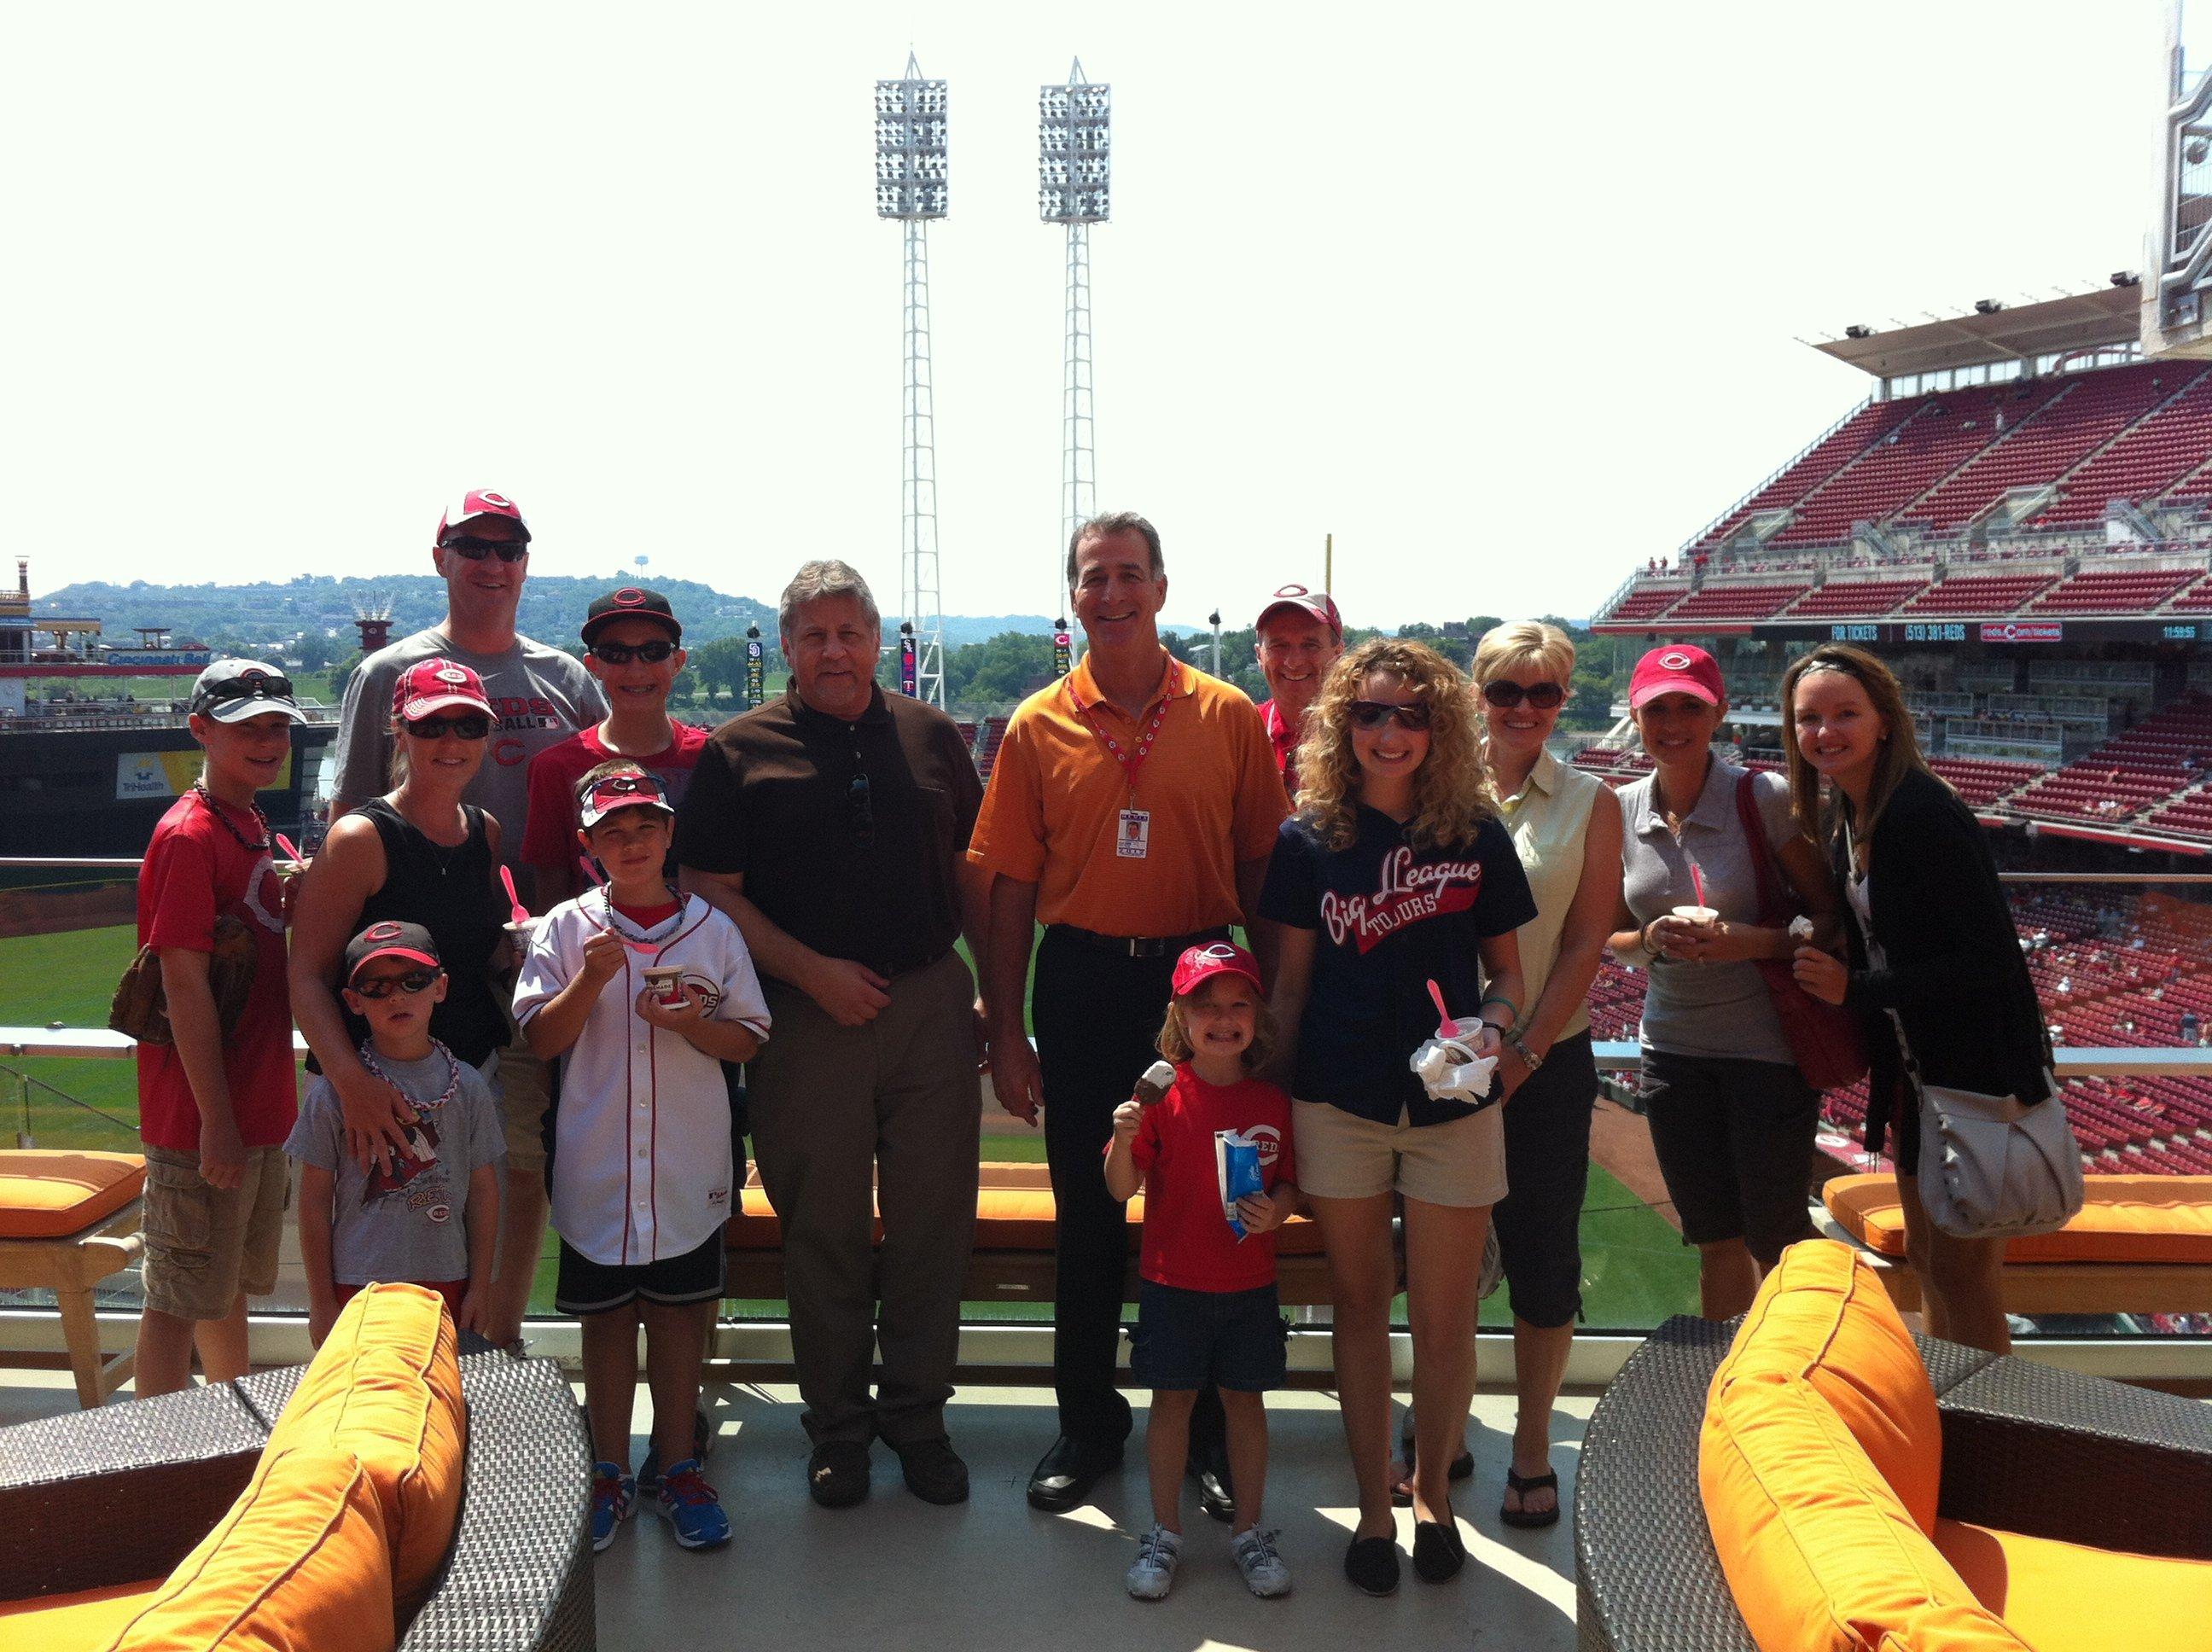 baseball road trip,baseball tour,great american ballpark,cincinnati,reds